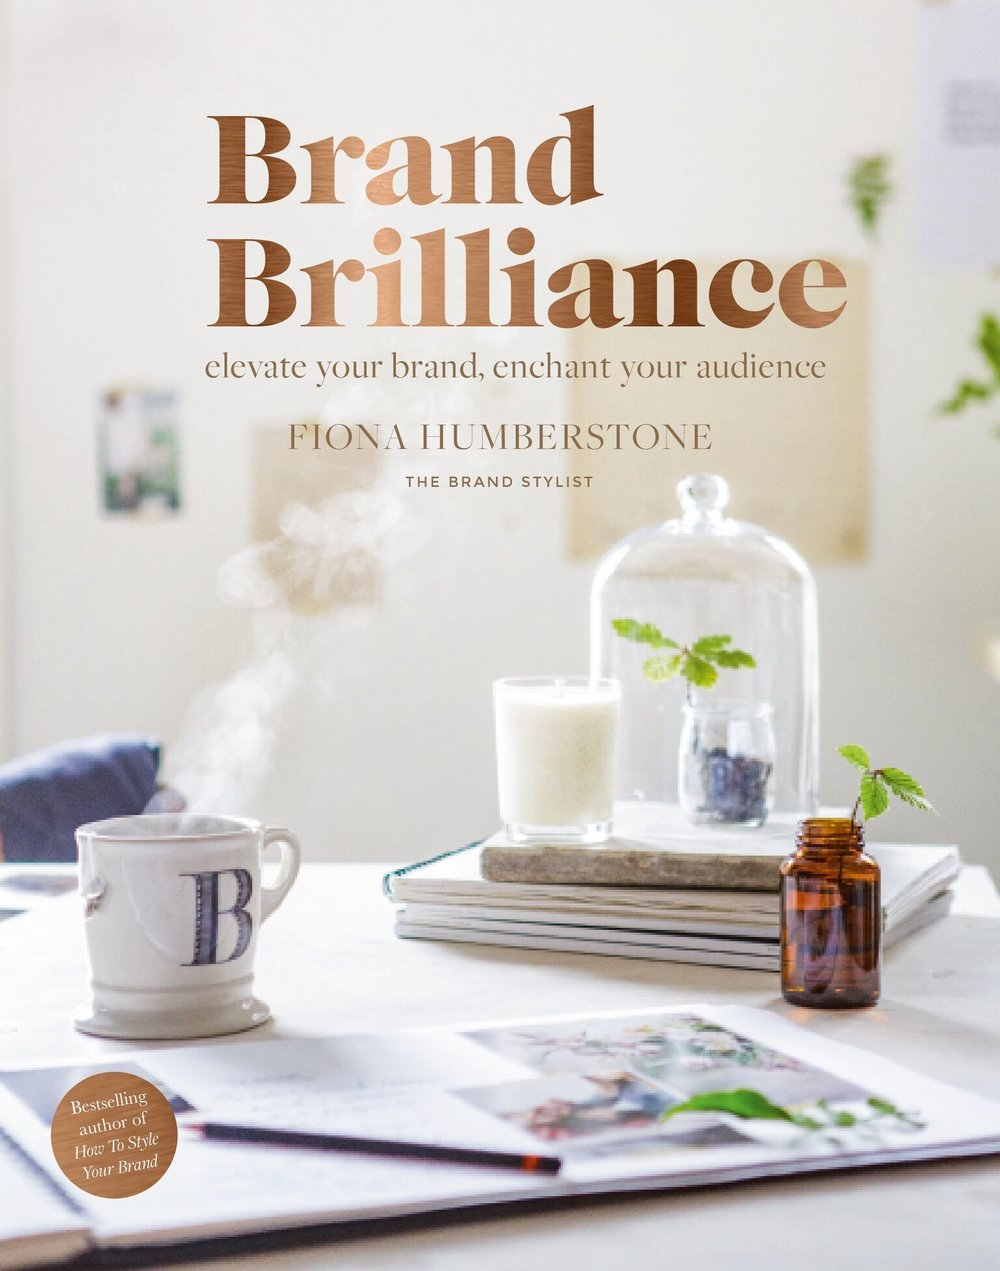 Brand Brilliange Fiona Humberstone The Brand Stylist